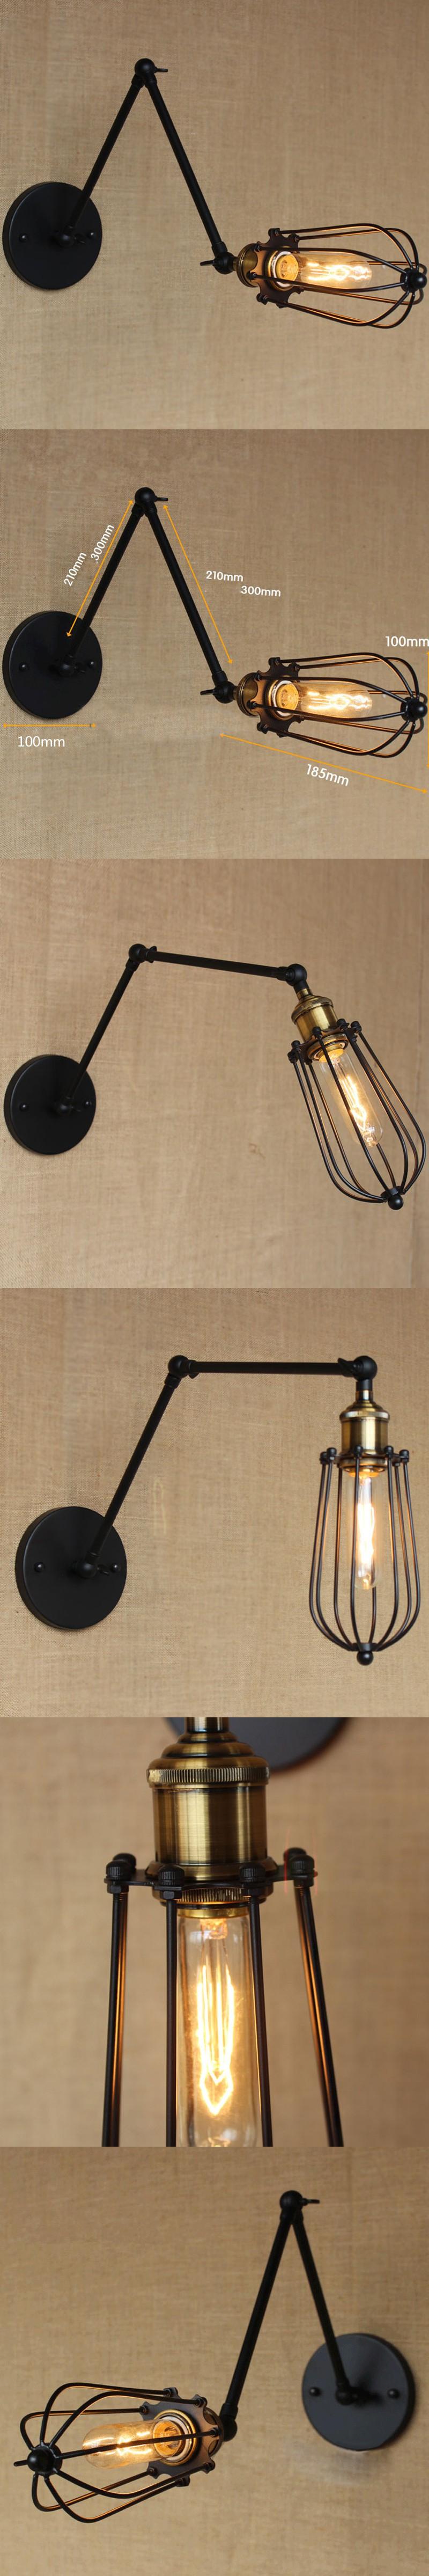 Free shipping Loft Industrial Vintage Wall Lamp E27 decoration Edison bulb Bedroom Bedside Mirror Modern Lighting home lighting  $60